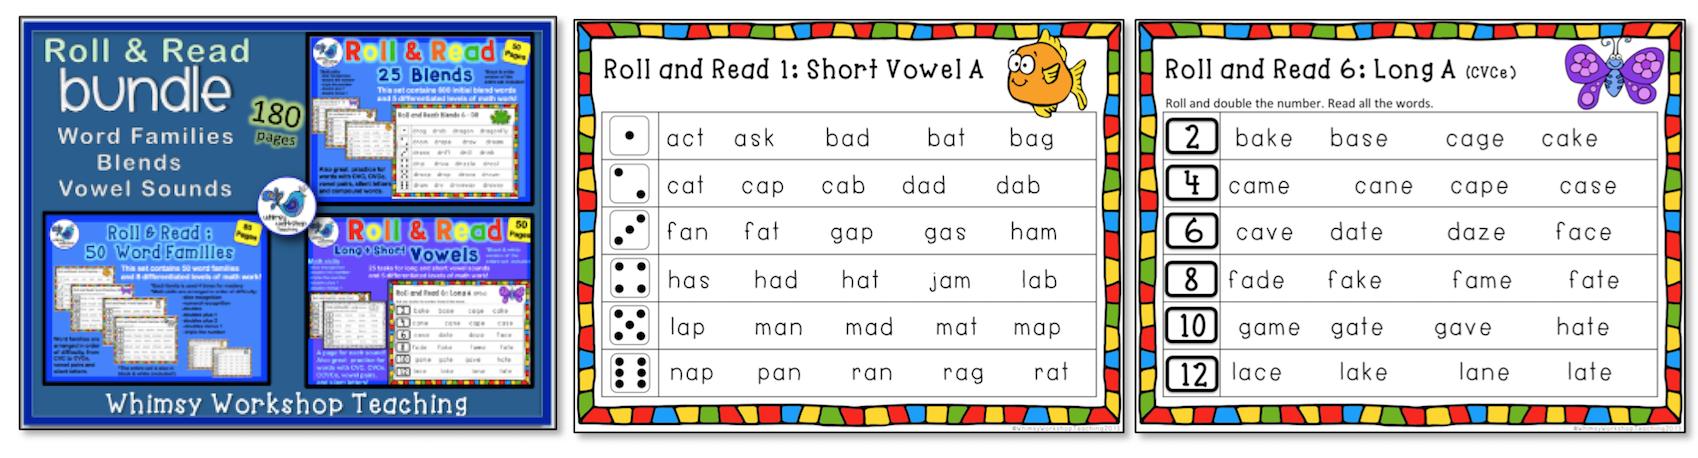 Roll & Read Bundle - Word Families - Blends - Vowels